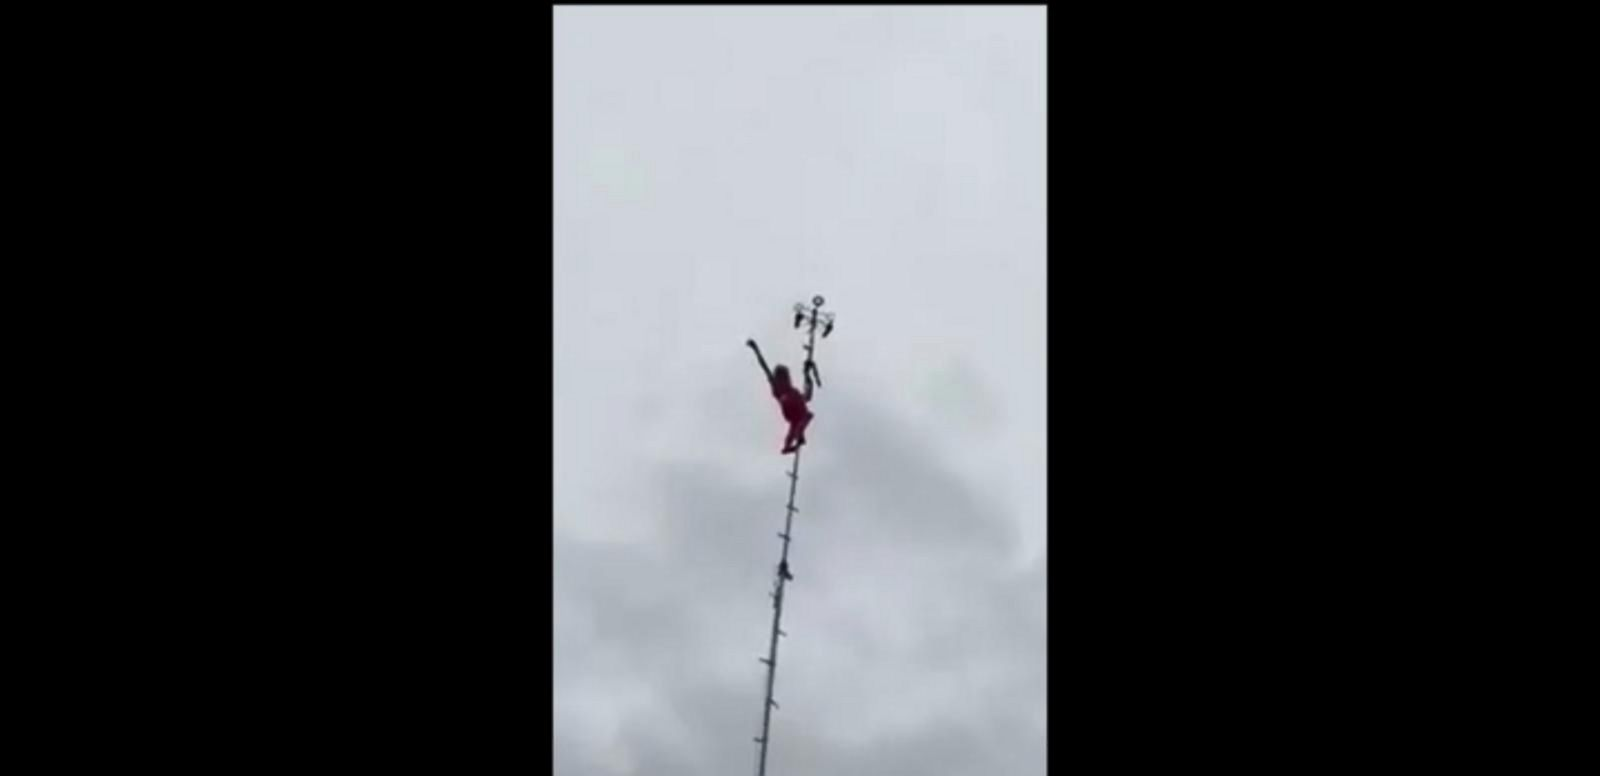 VIDEO: 80-Year-Old Dare Devil Grandma Hangs 100 Feet in the Air